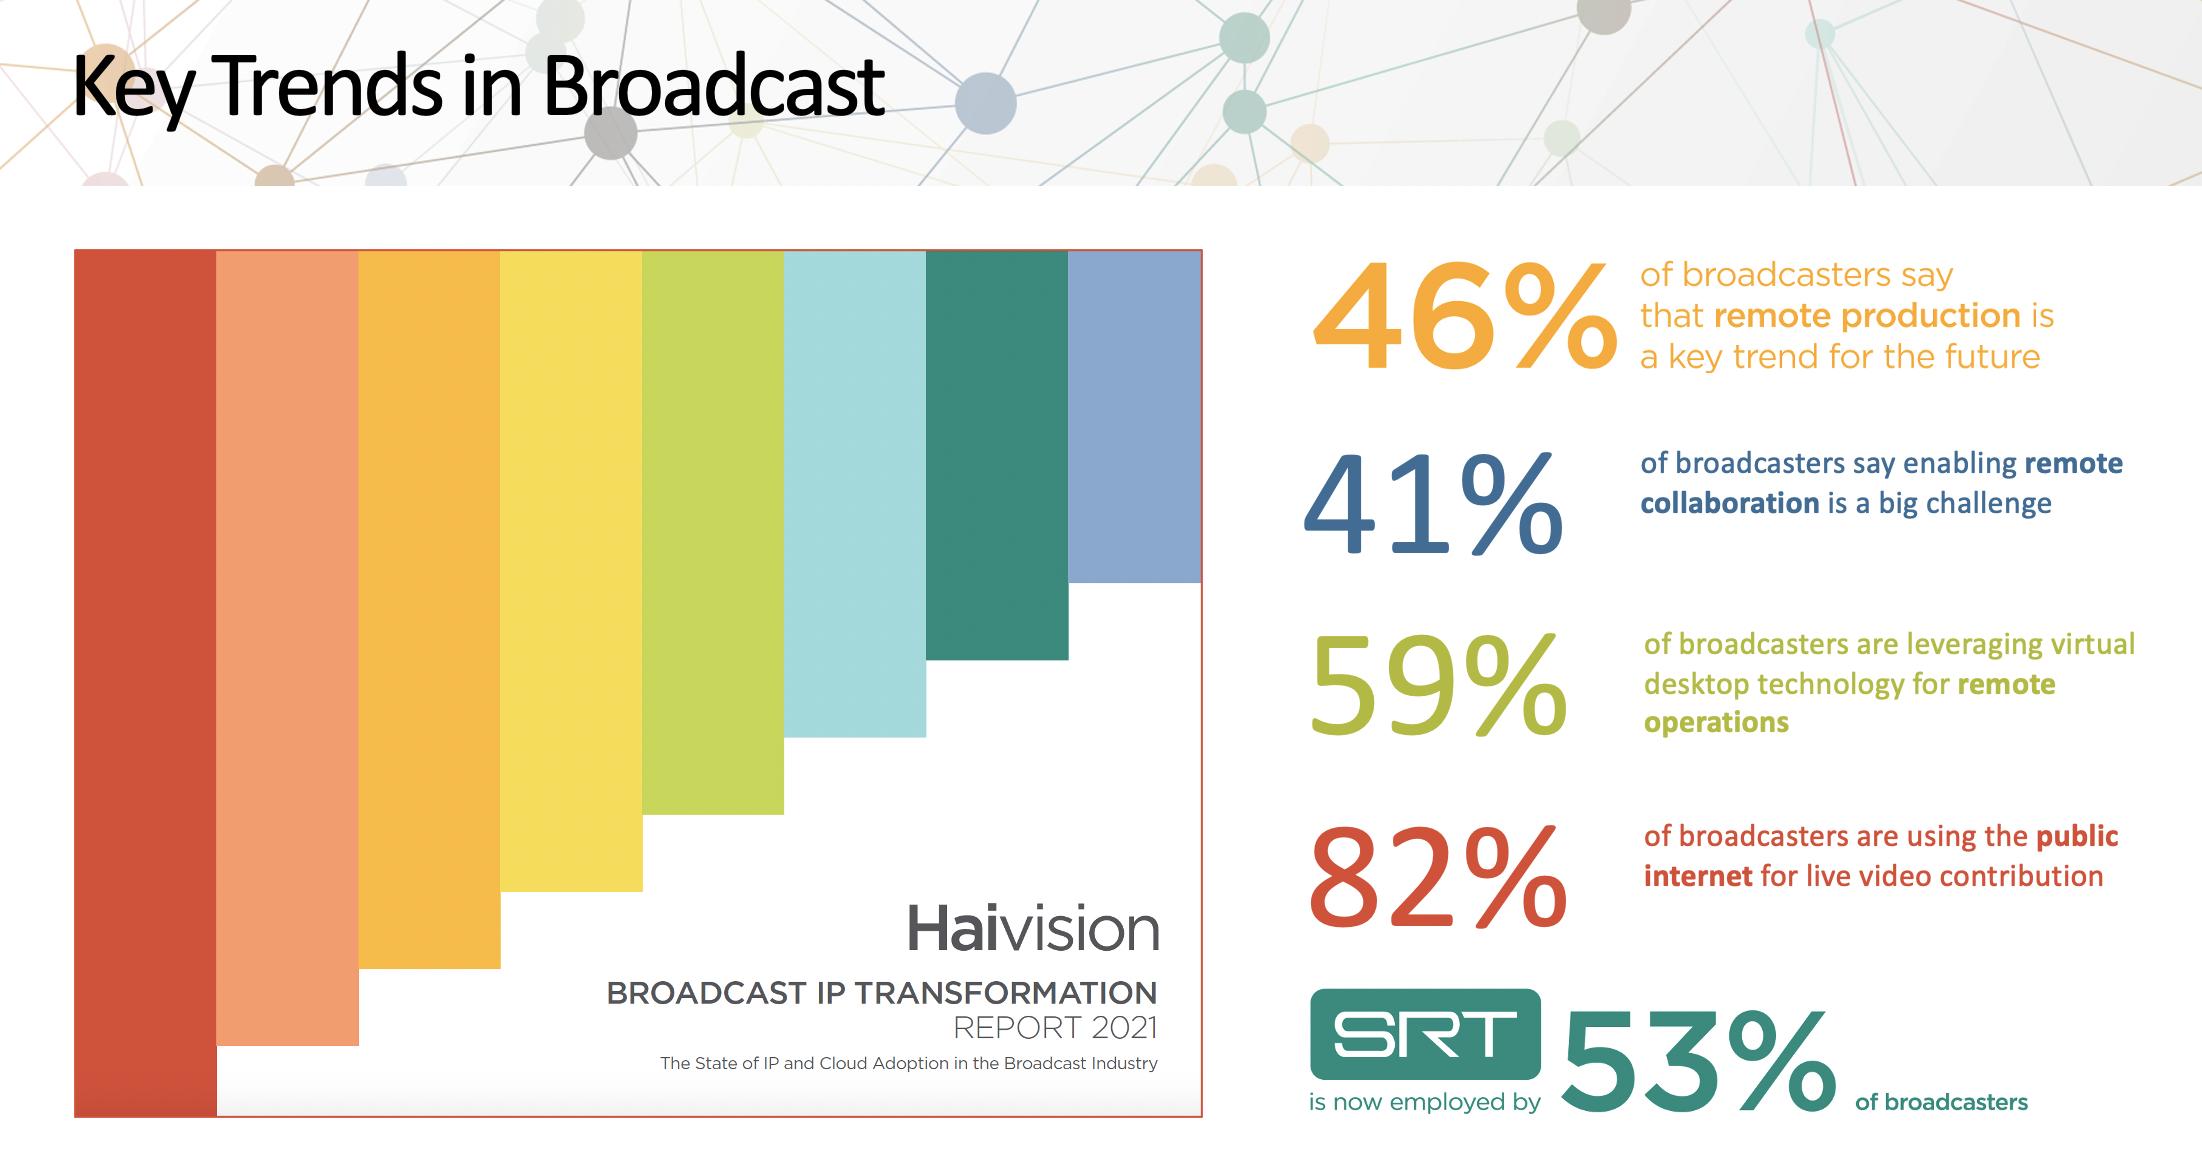 Key Trends in Broadcast